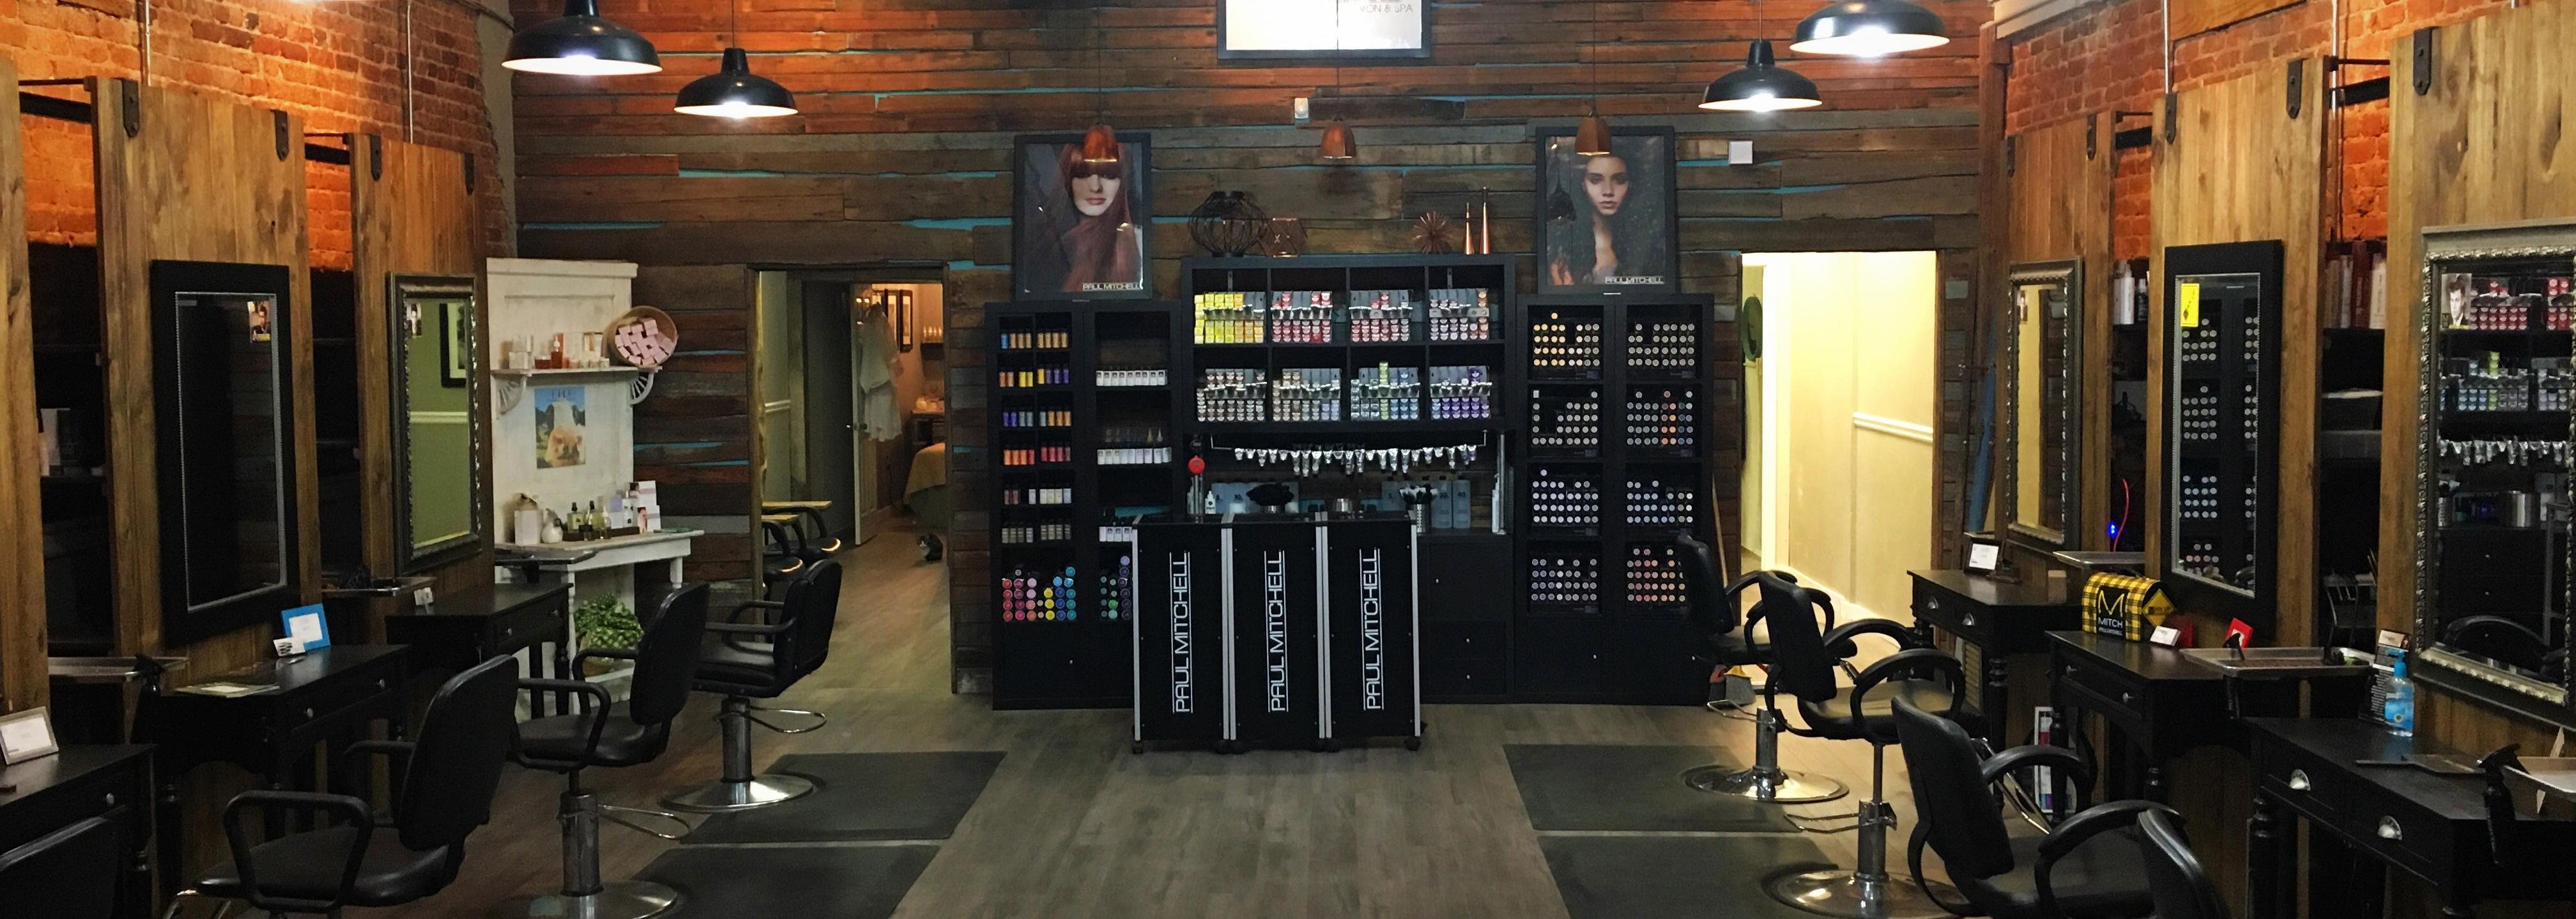 Hair Salons In Savannah Ga Open On Sunday   lajoshrich.com